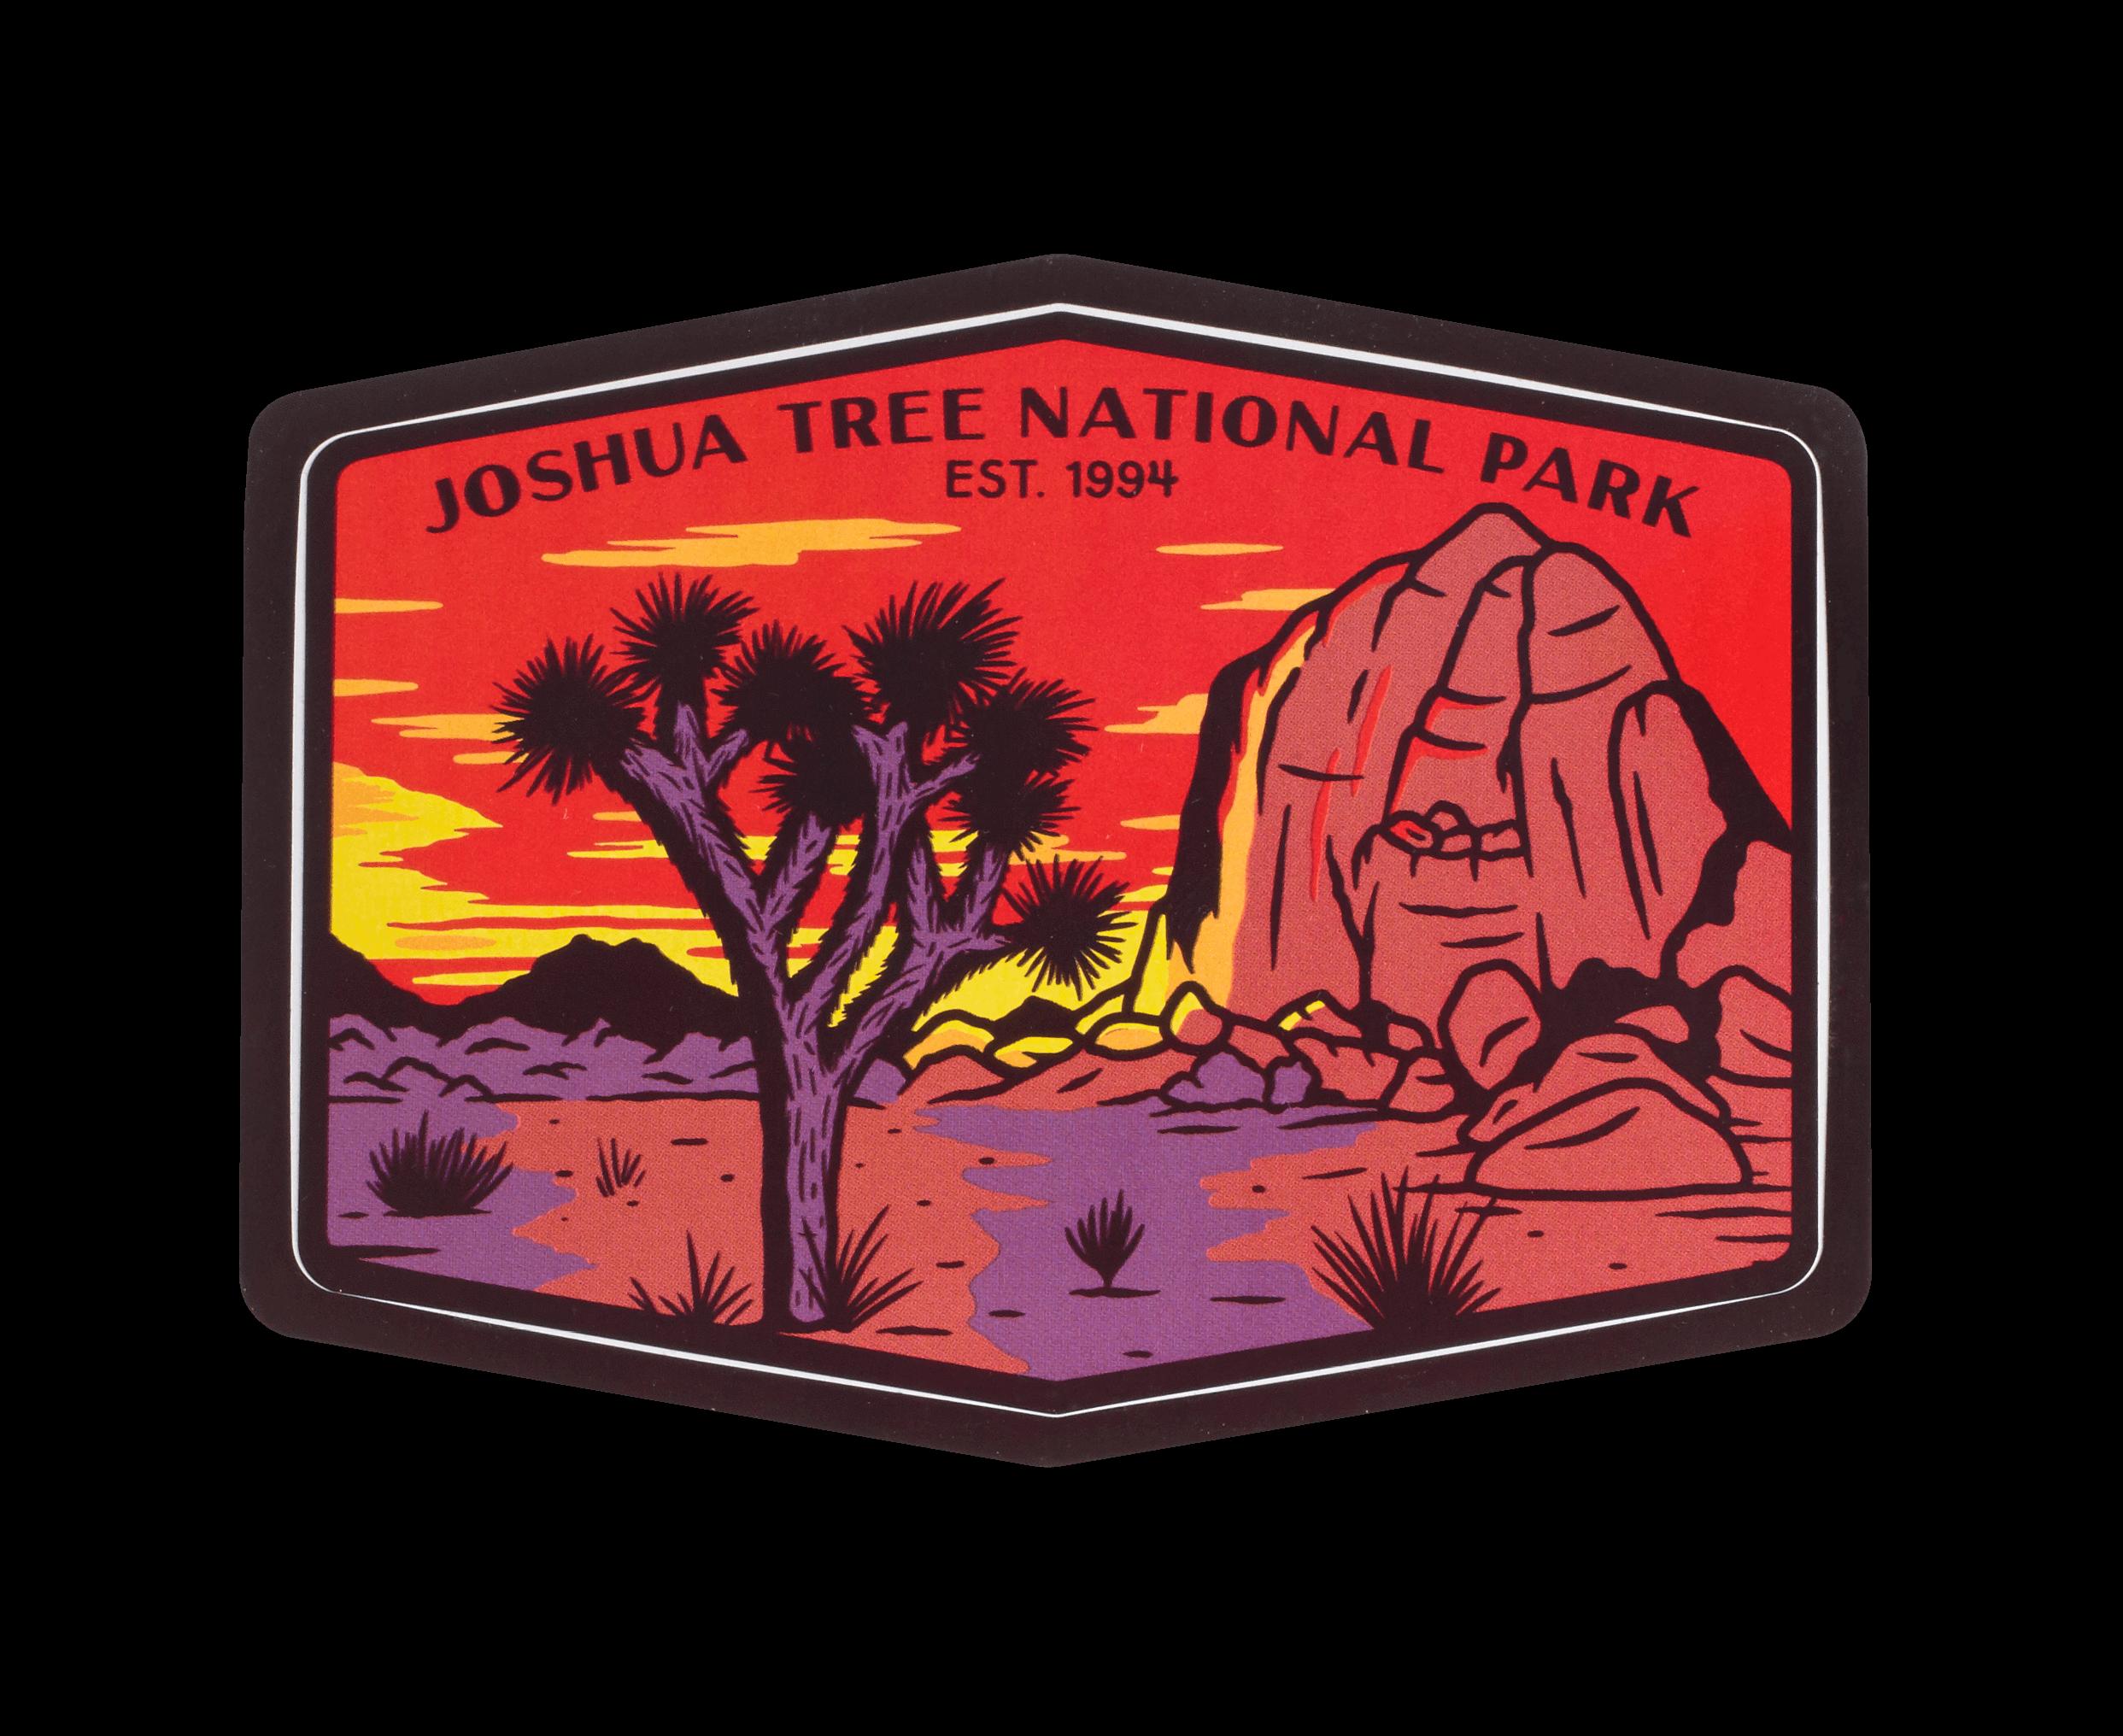 Joshua tree national park clipart clip free library Joshua Tree National Park Sticker clip free library